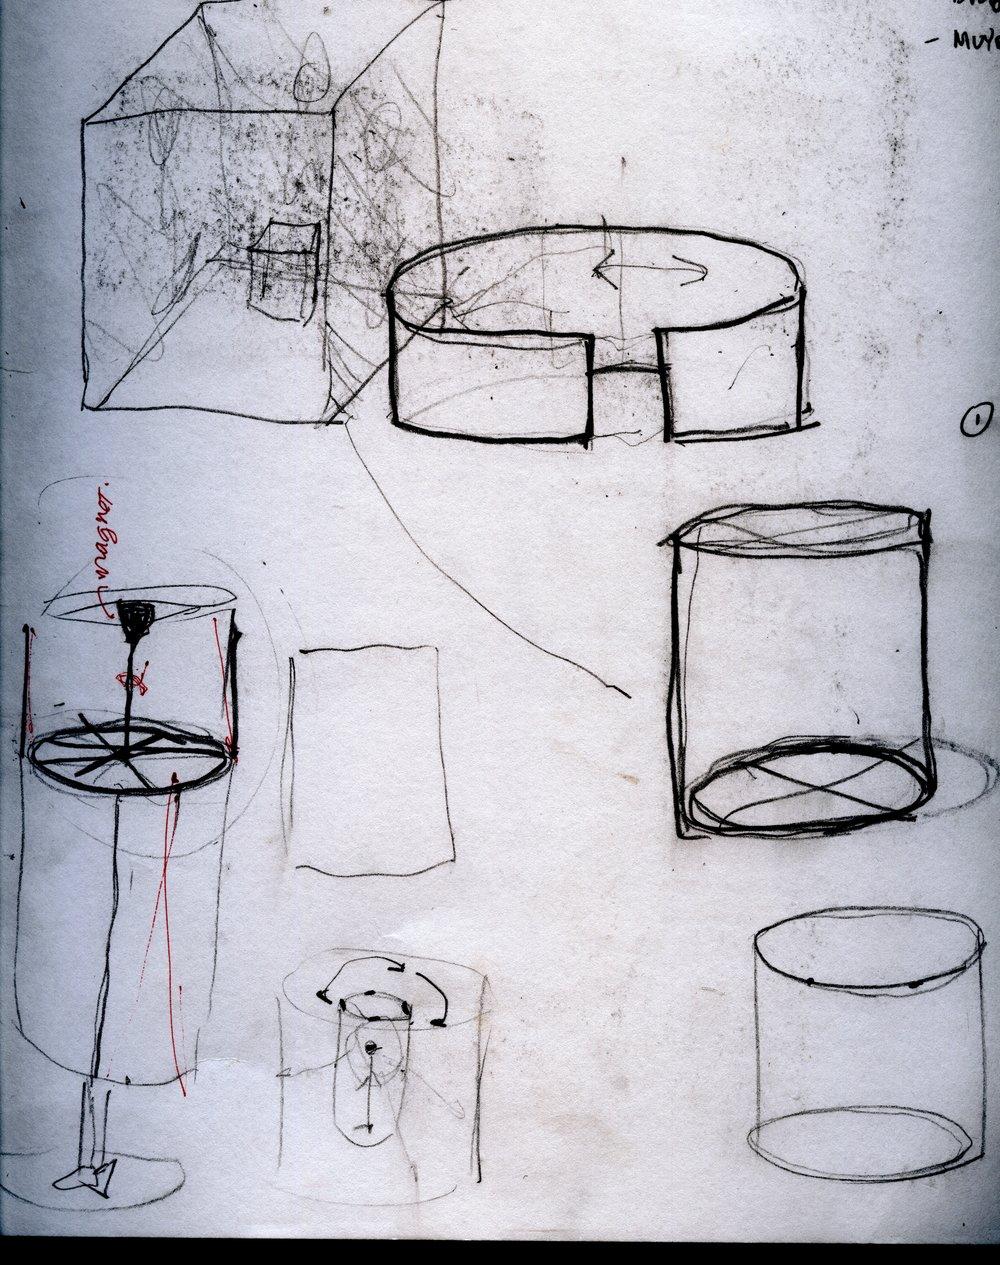 Development sketches